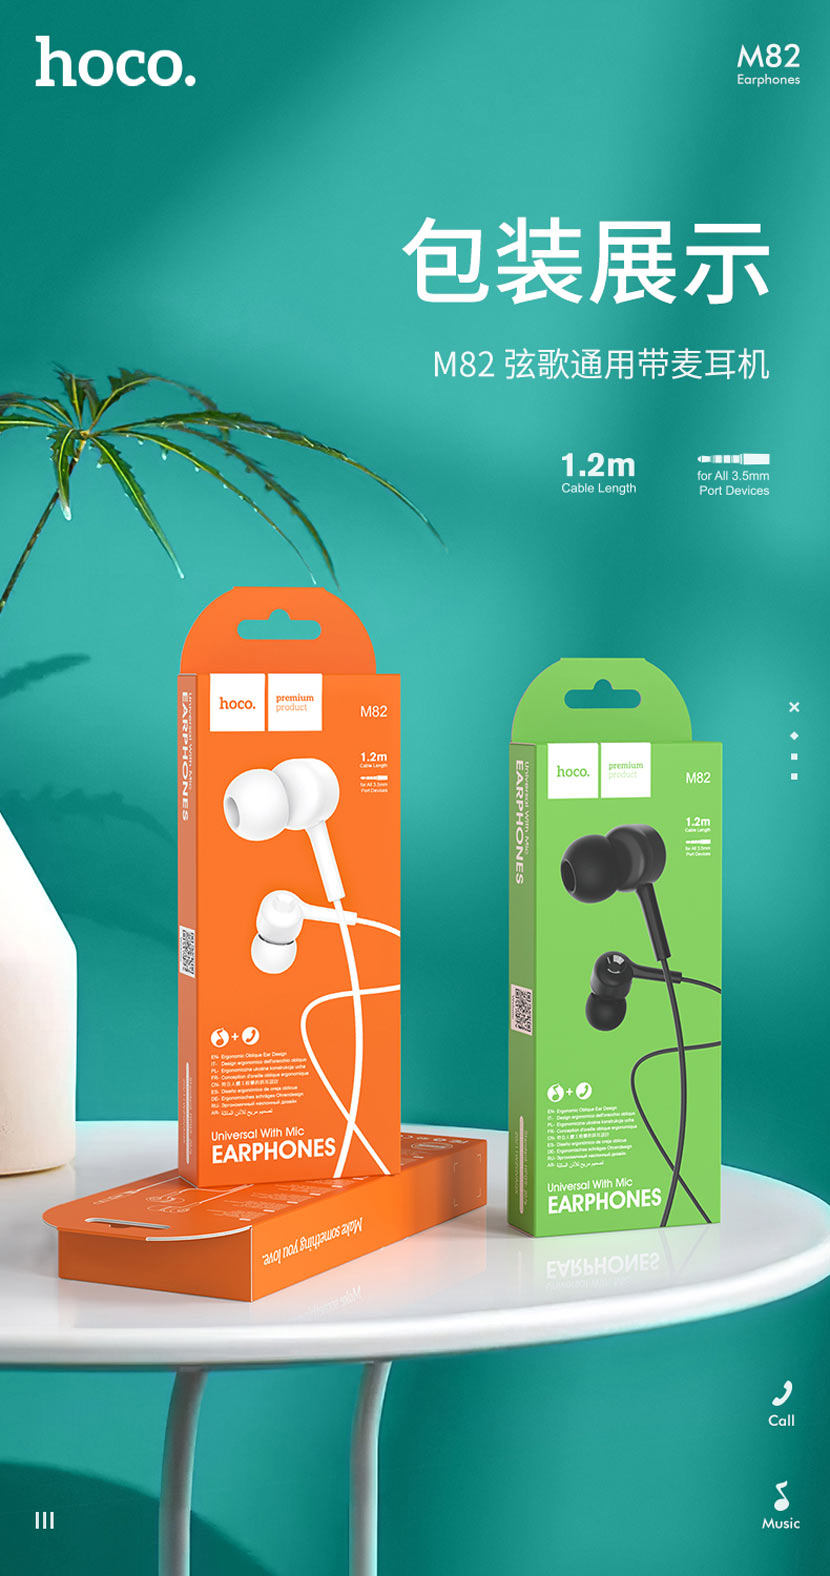 hoco news m82 la musique universal earphones with mic package cn